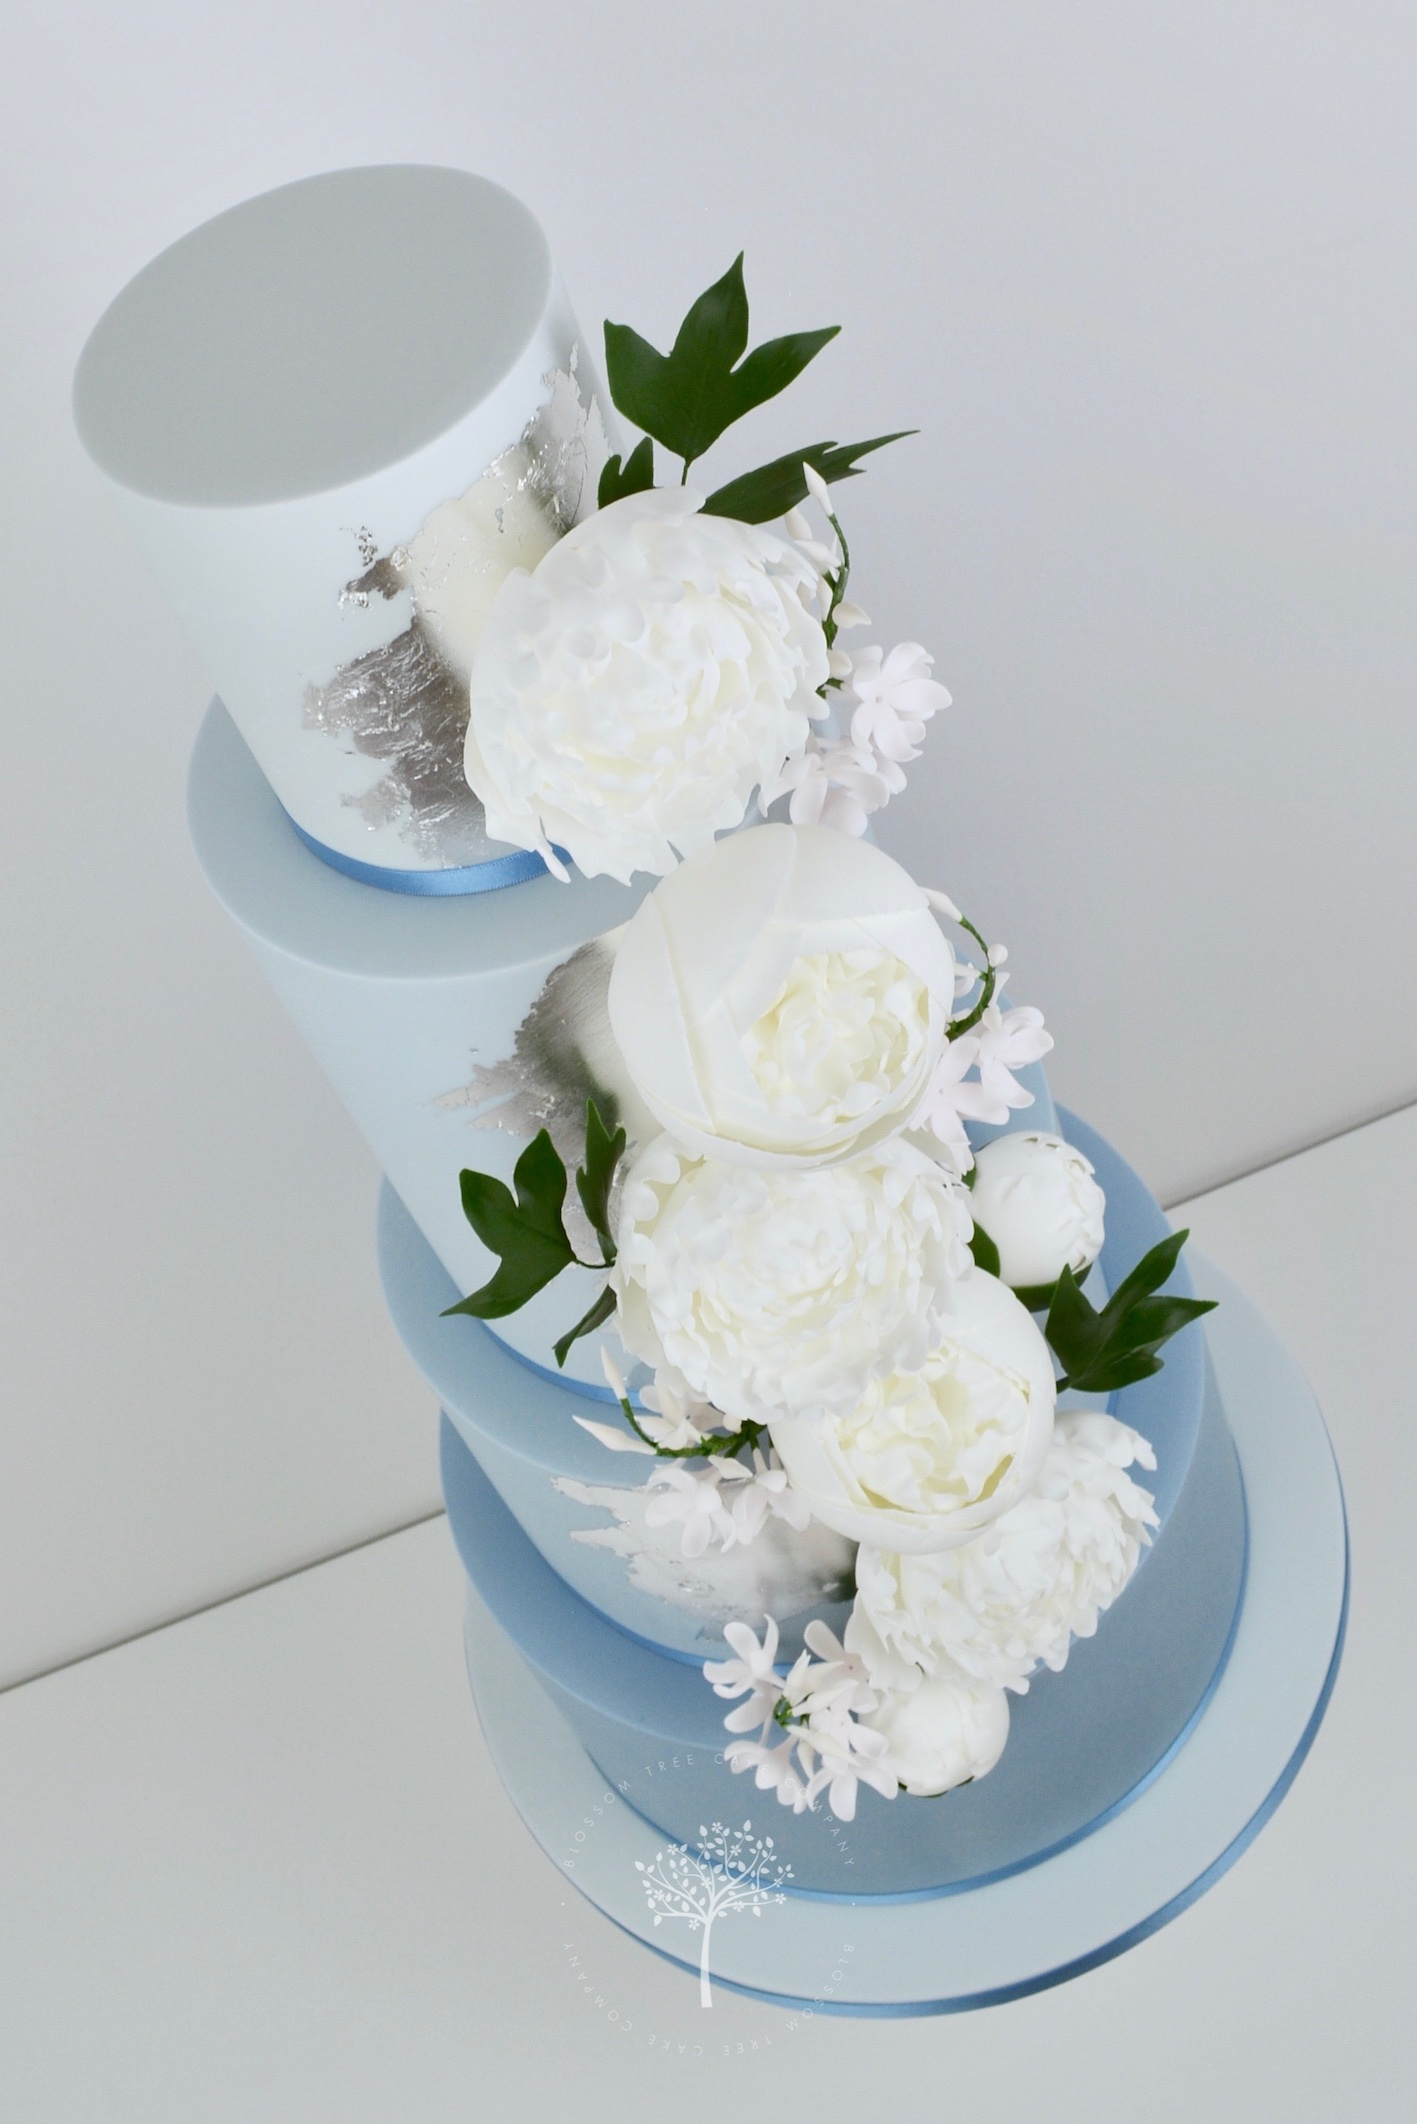 Dusky Blue and Peony wedding cake by Blossom Tree Cake Company Harrogate North Yorkshire - angle.jpg